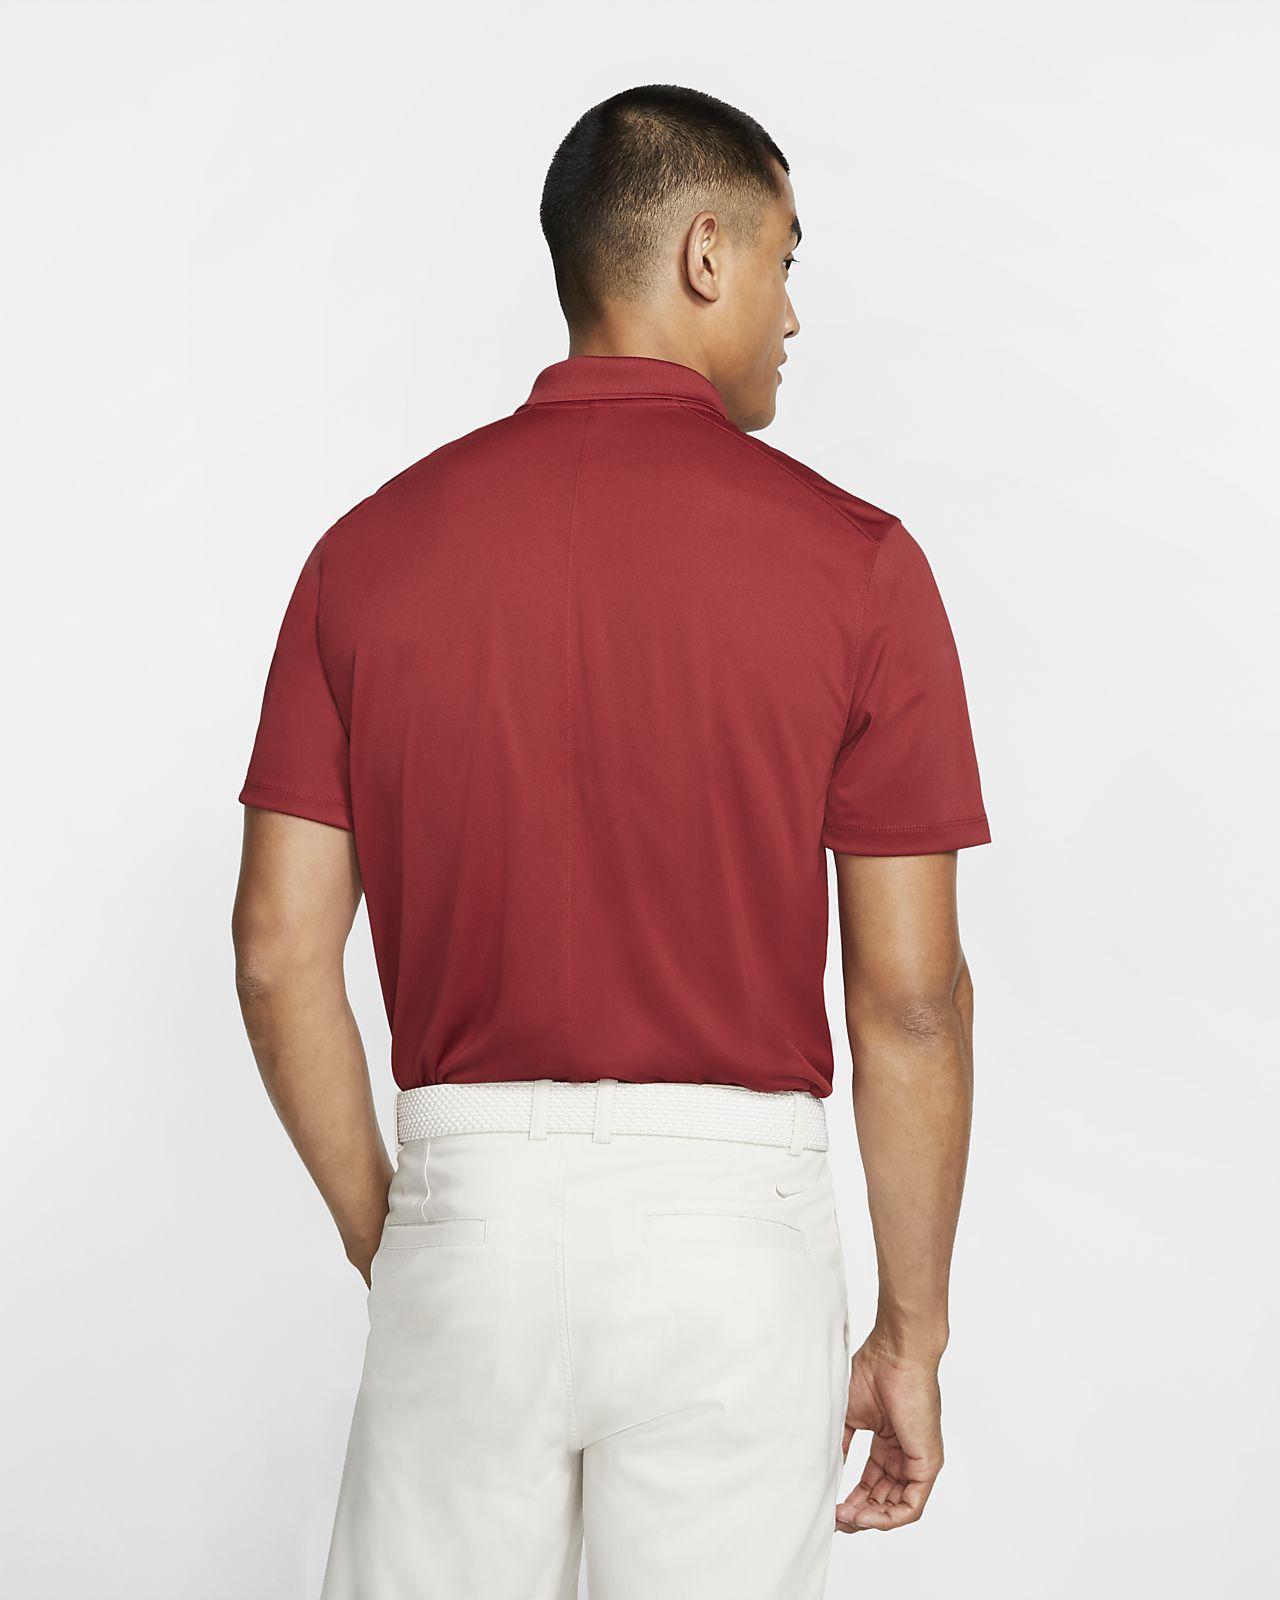 a206fa1f Nike Dri-FIT Victory Men's Golf Polo. Nike.com